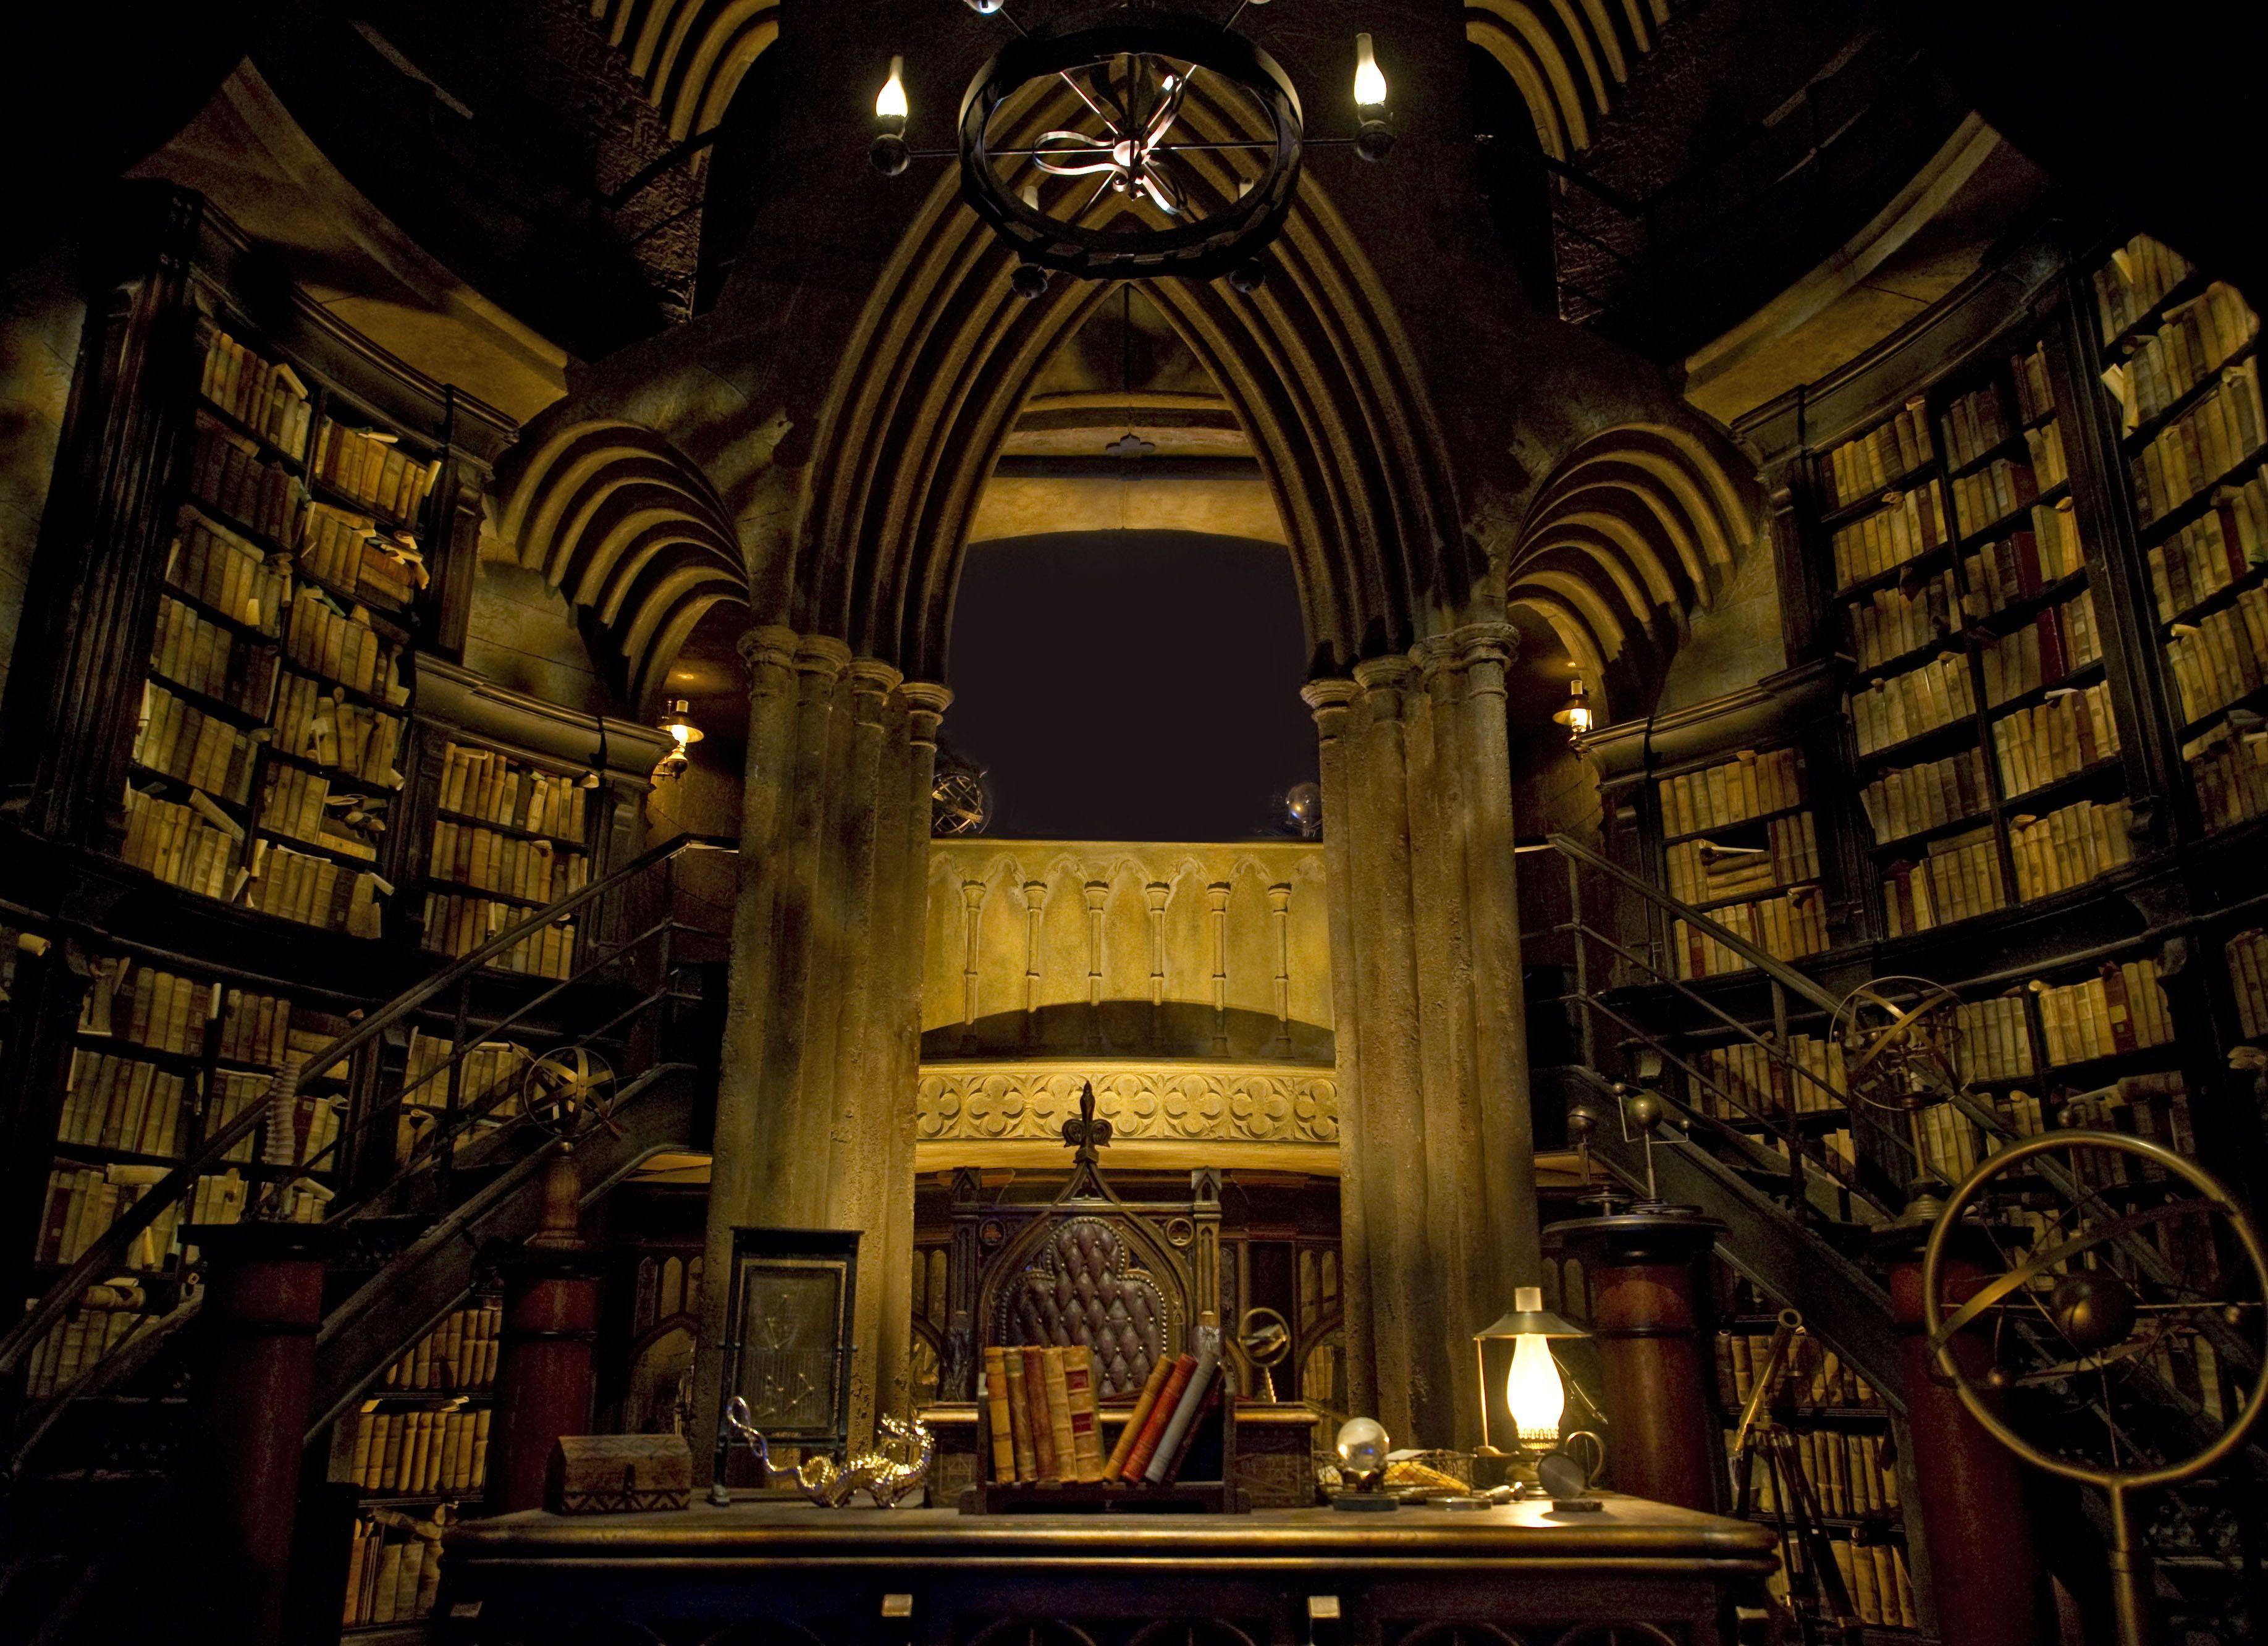 Dumbledore S Office Library Universal Studios Orlando Harry Potter Library Harry Potter Orlando Universal Studios Orlando Harry Potter